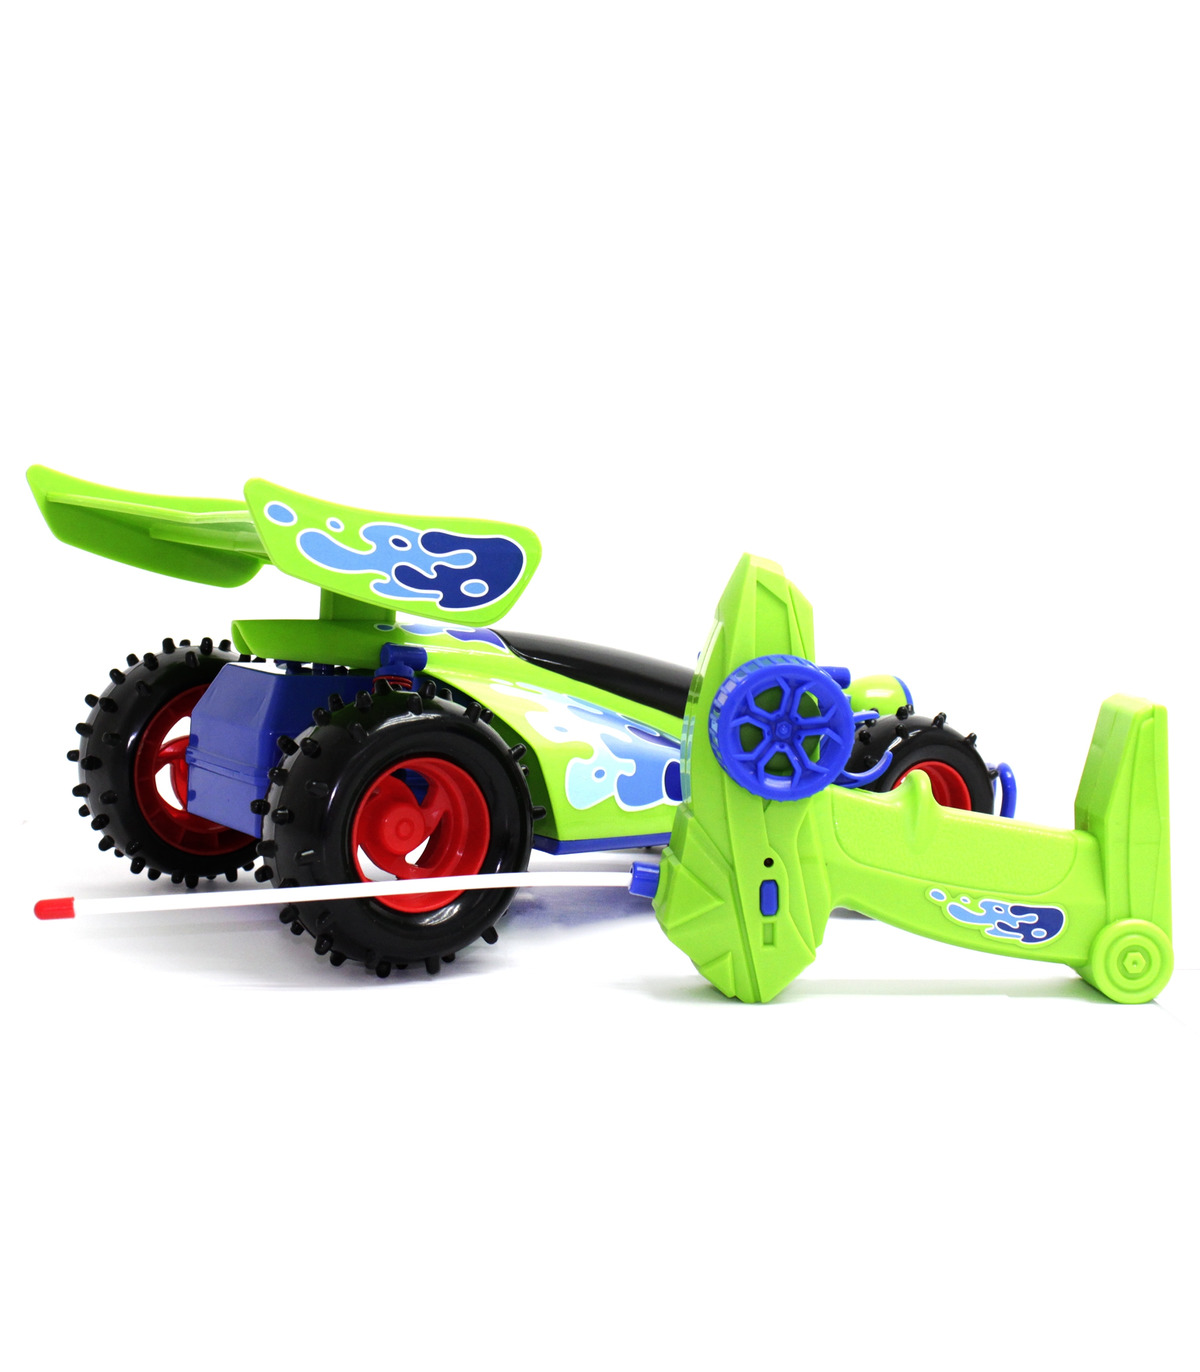 Toy Story 4 Rc Vehiculo Control Remoto 35cm Disney